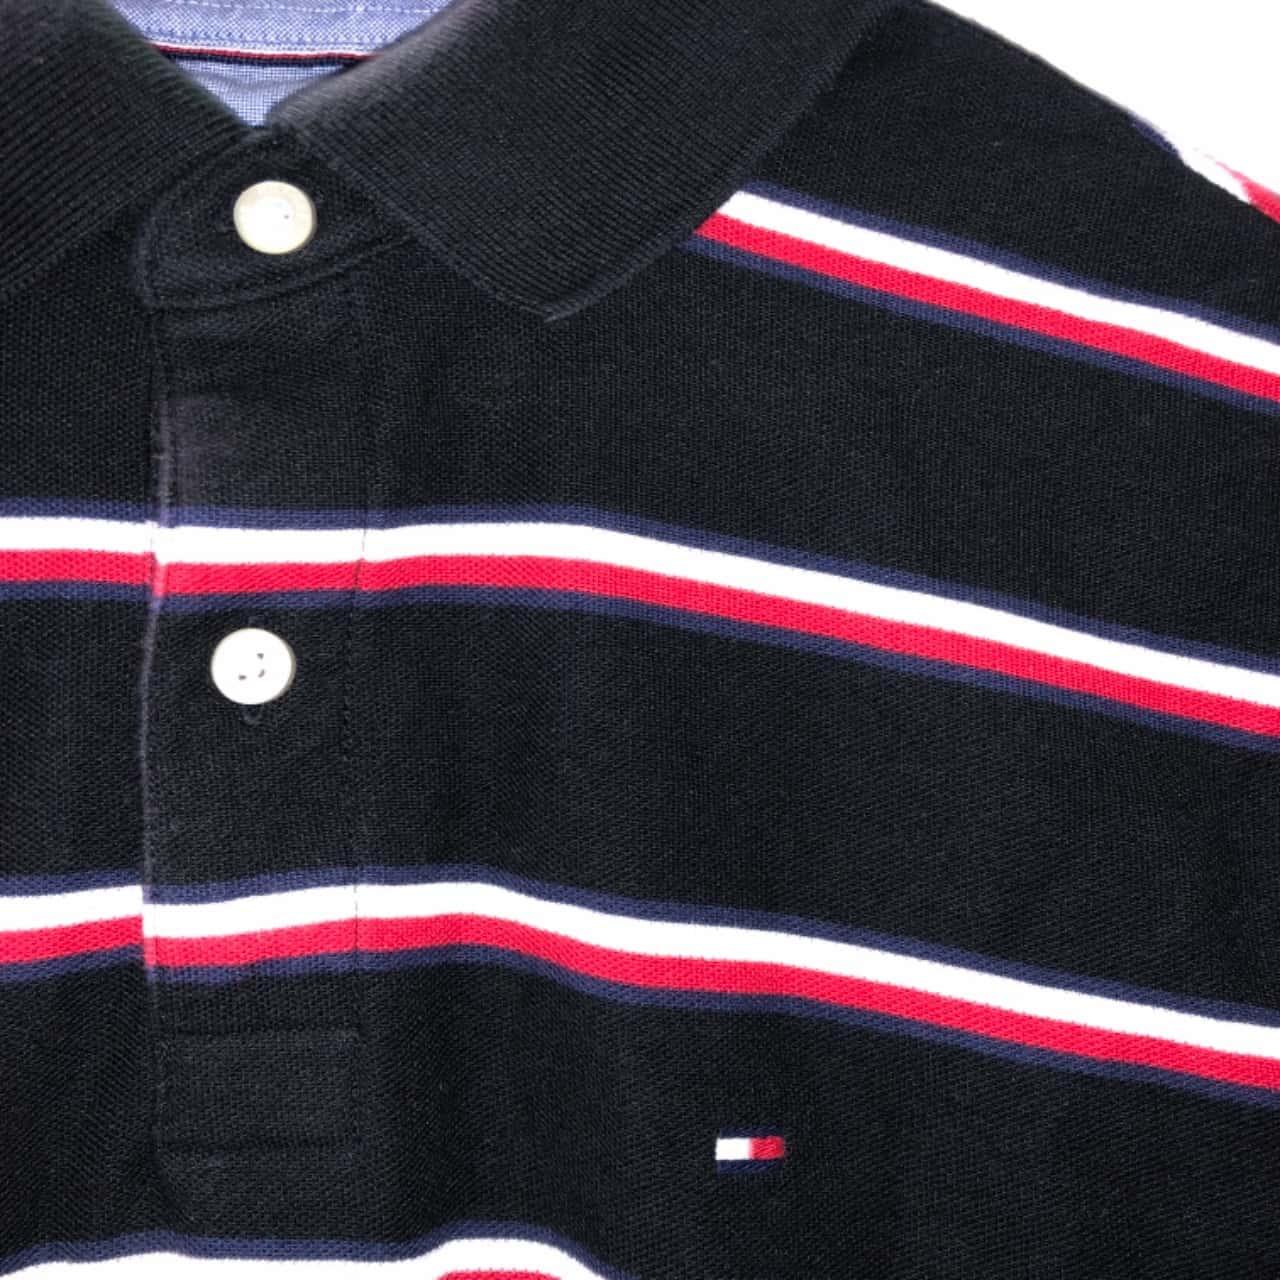 Tommy Hilfiger Mens  Size M Short Sleeve Top Black /Striped